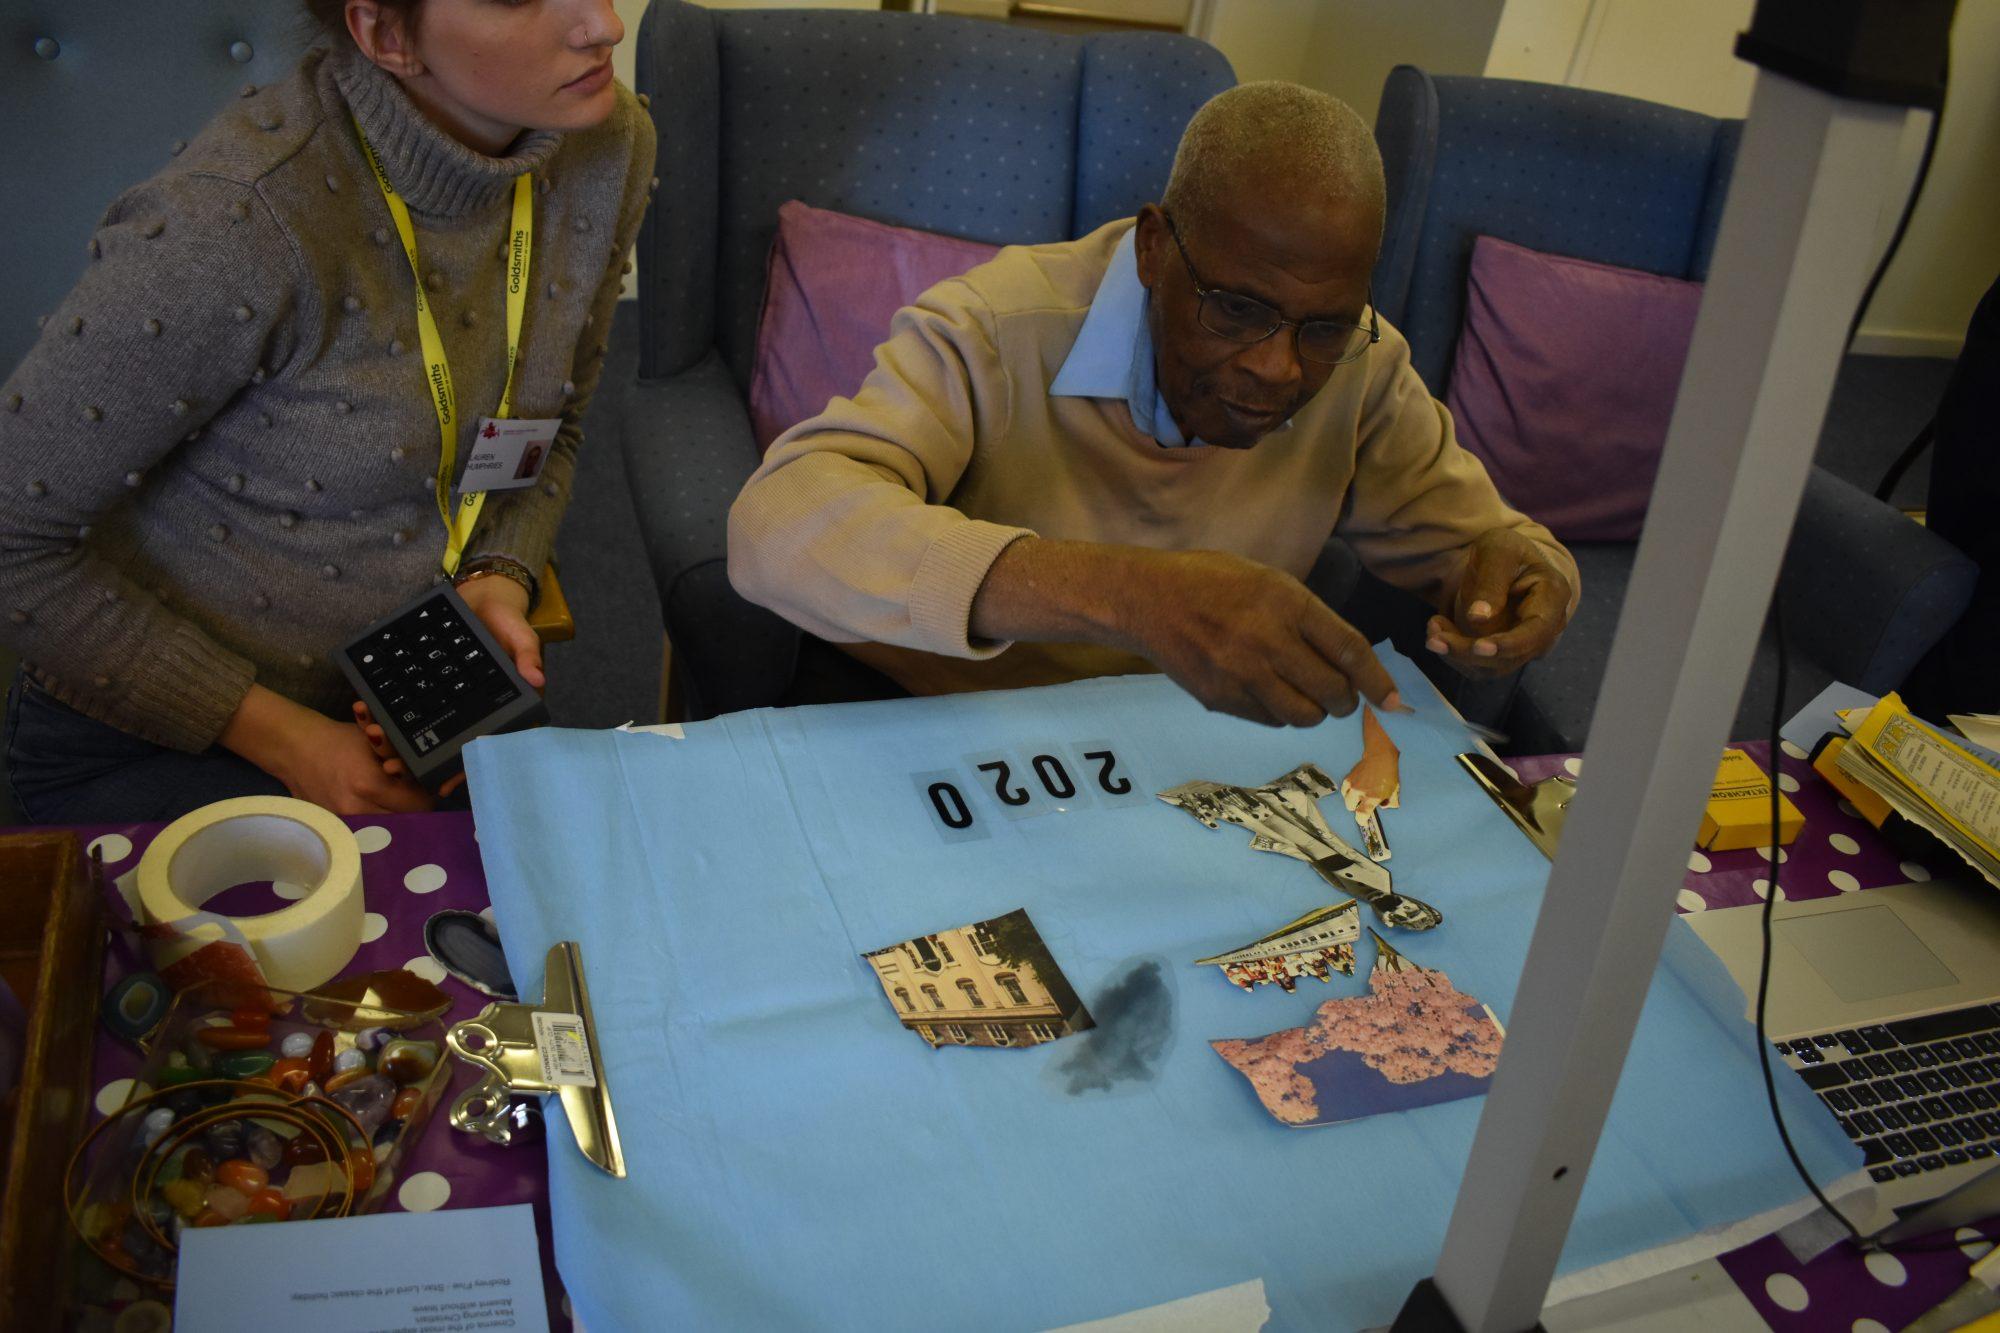 Man doing artwork at a table